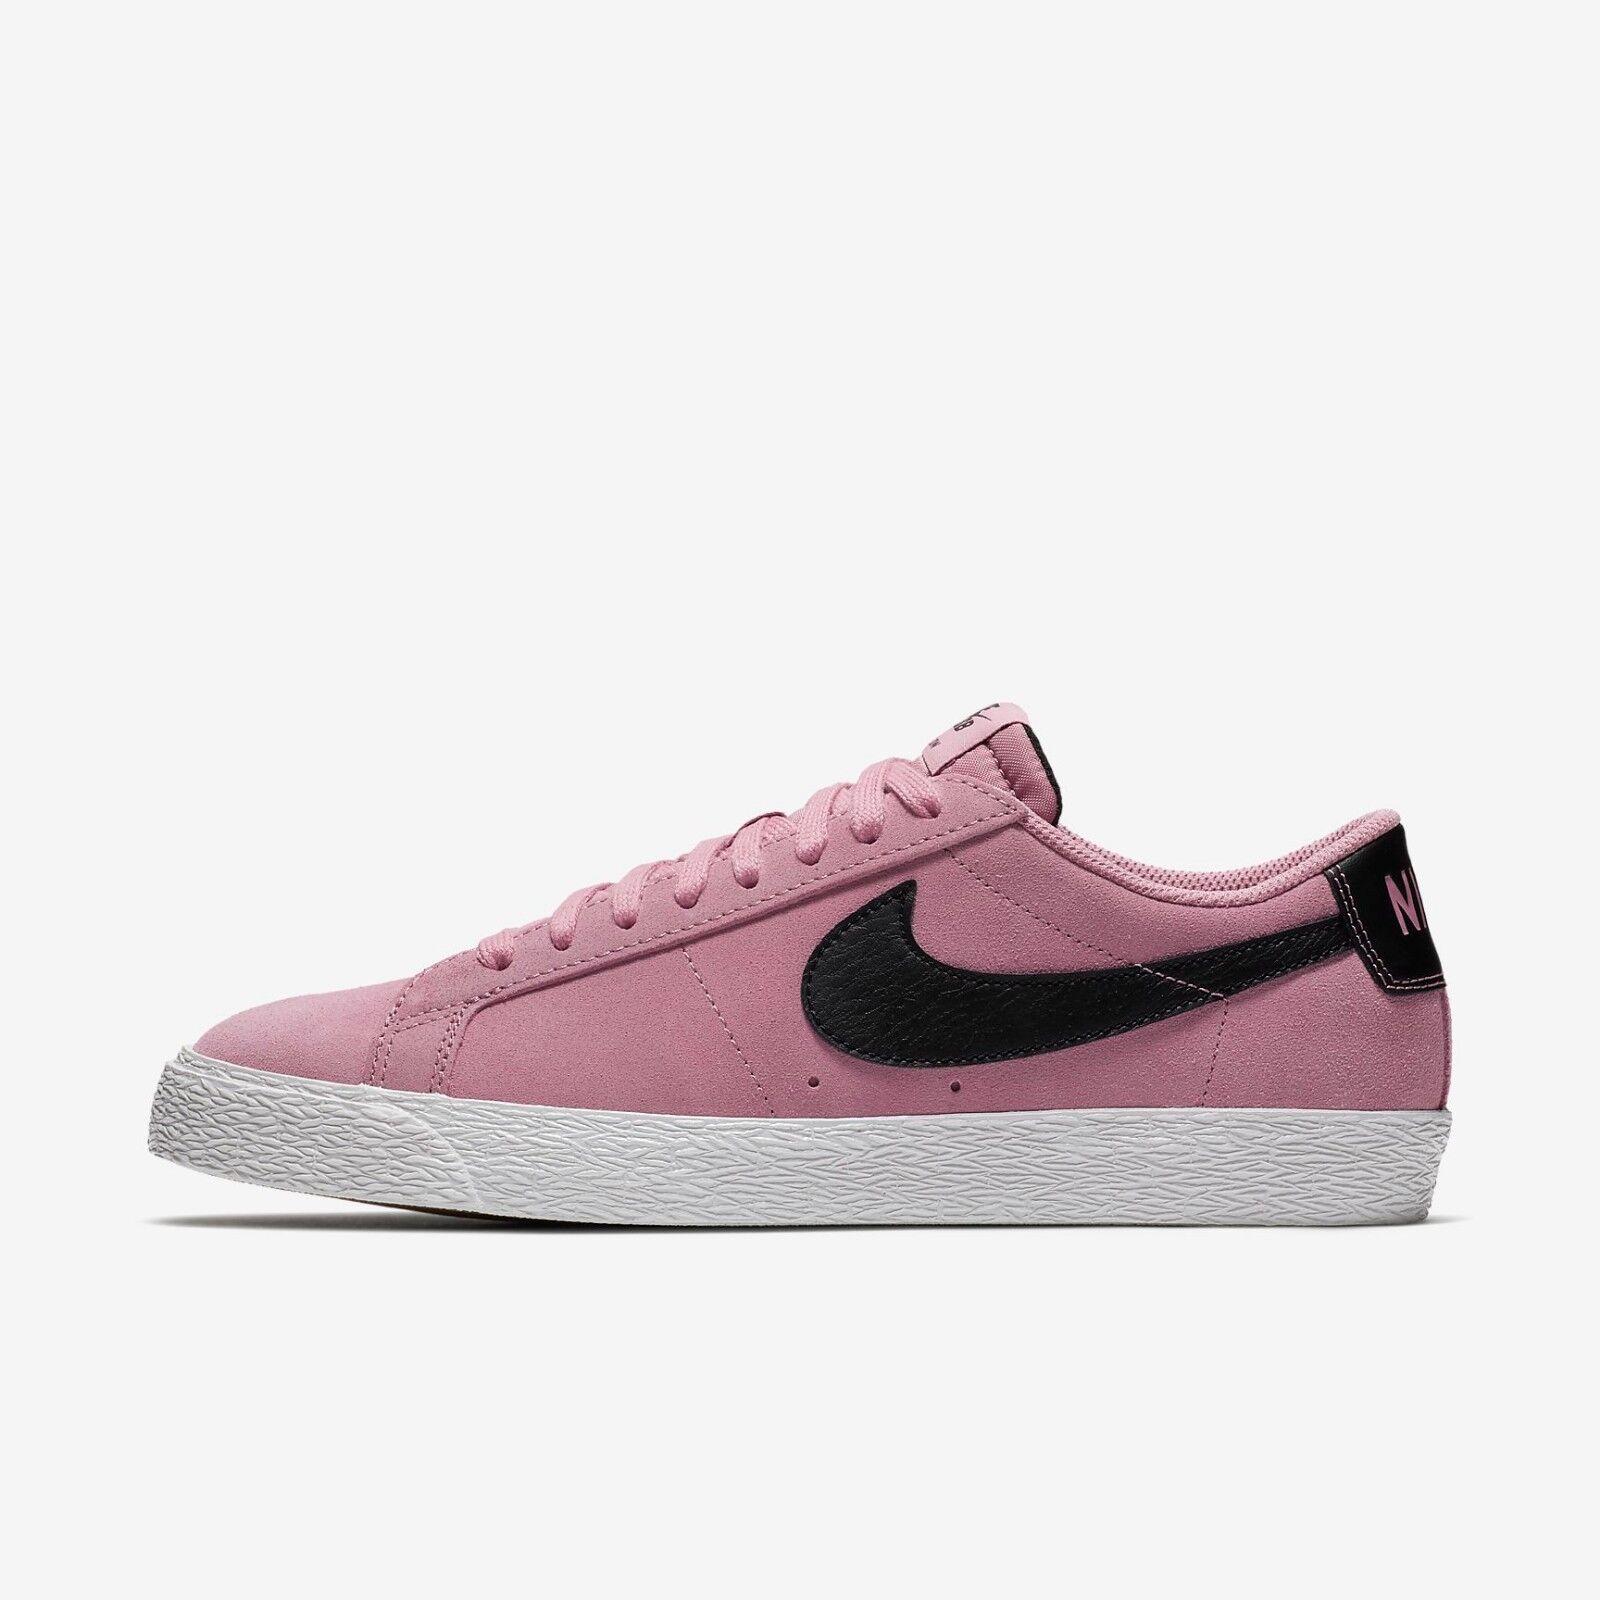 Nike de SB-Blazer Bajo | Para Hombre Zapatillas de Nike Skate - 864347-600 ROSA | 468b35